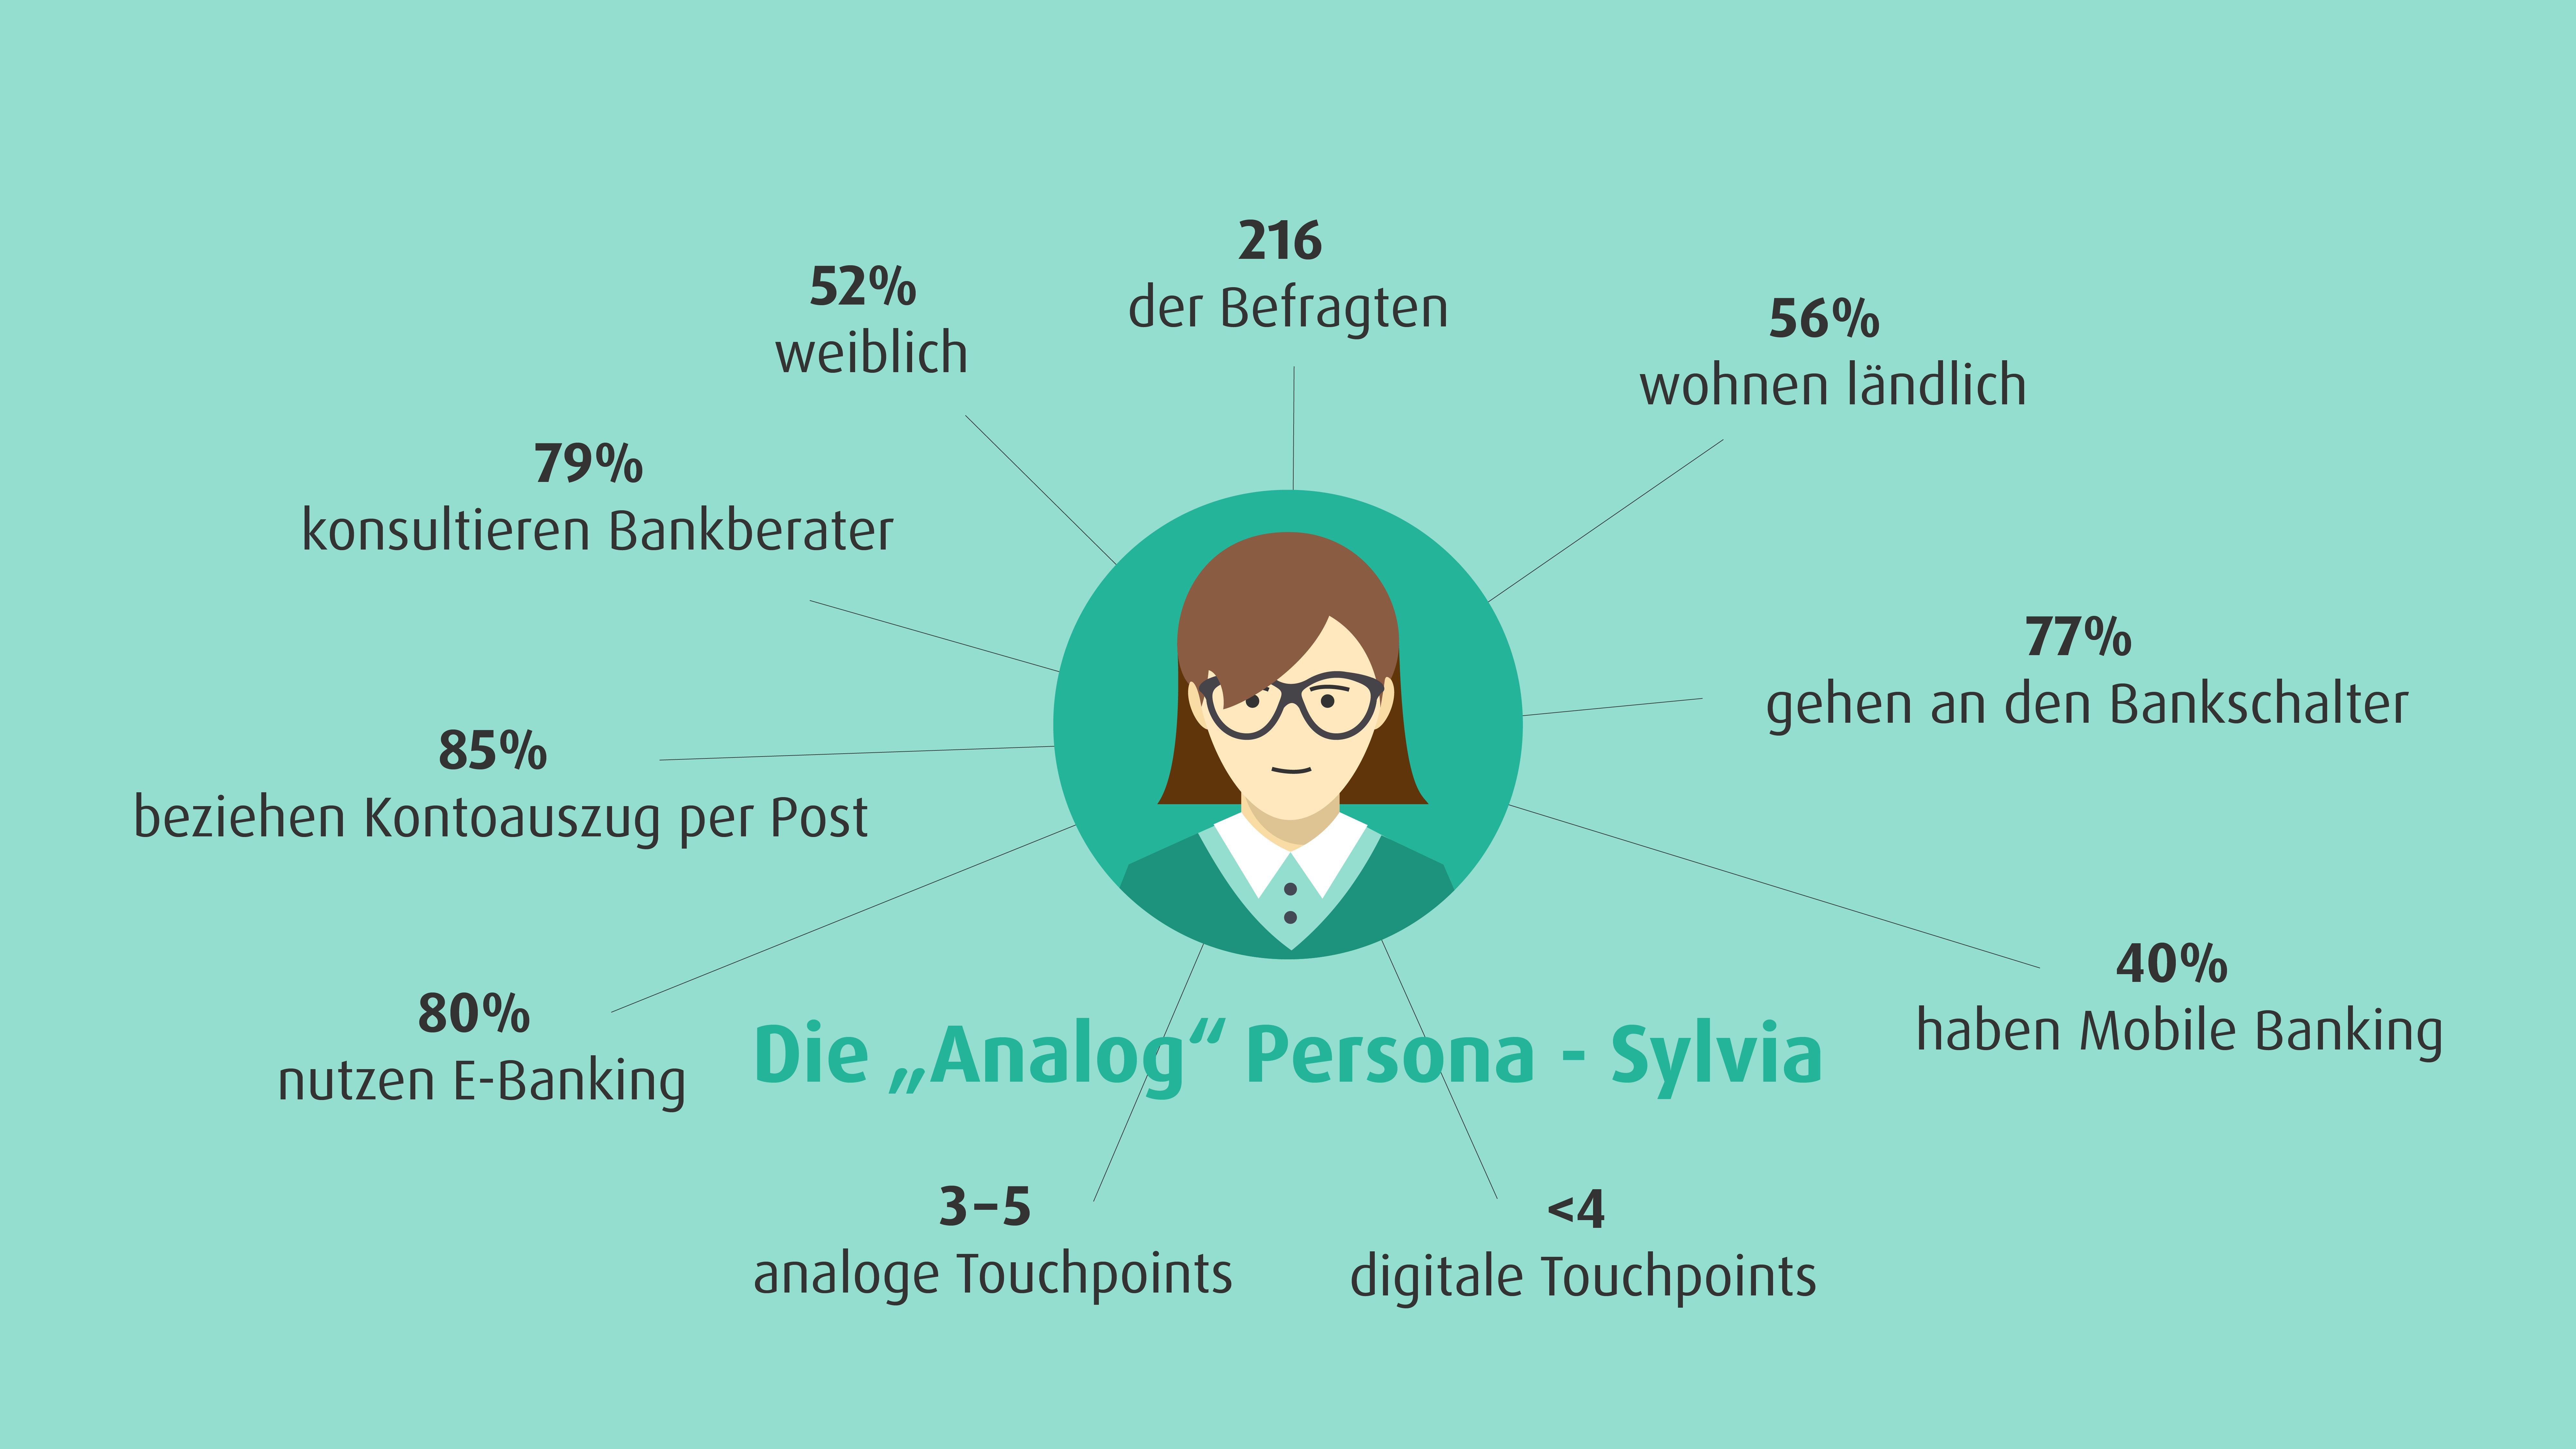 02_Sylvia_Die betrachteten Customer Personas